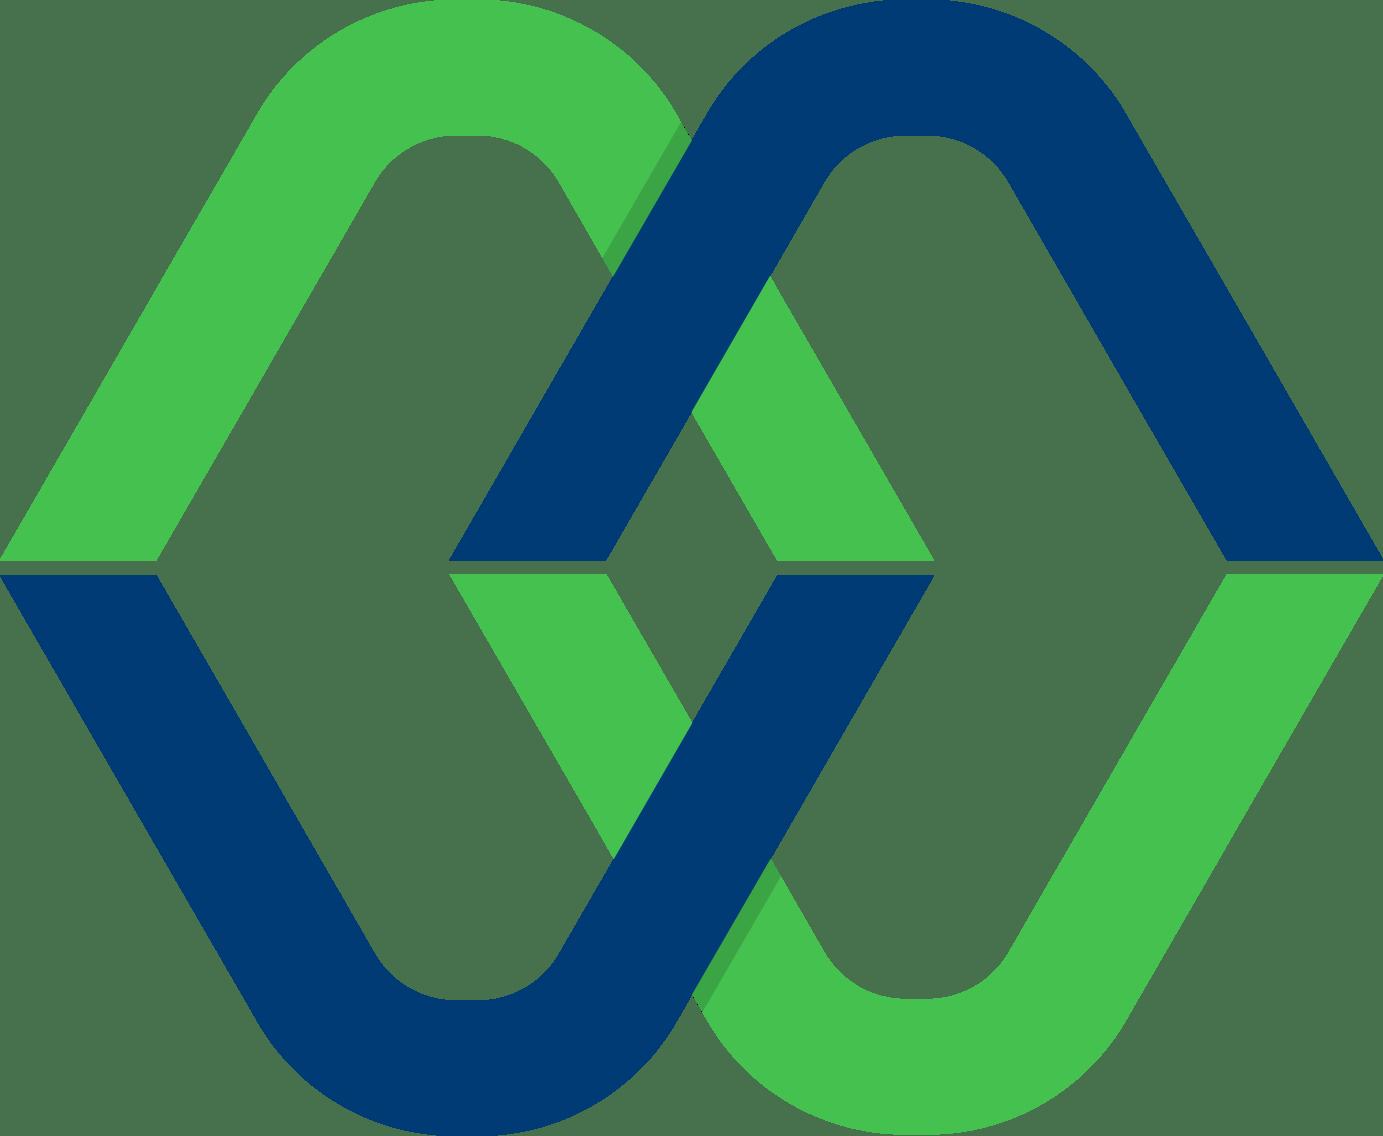 WellmartCBD | CBD Moonrocks | CBD Flower | CBD Wholesale